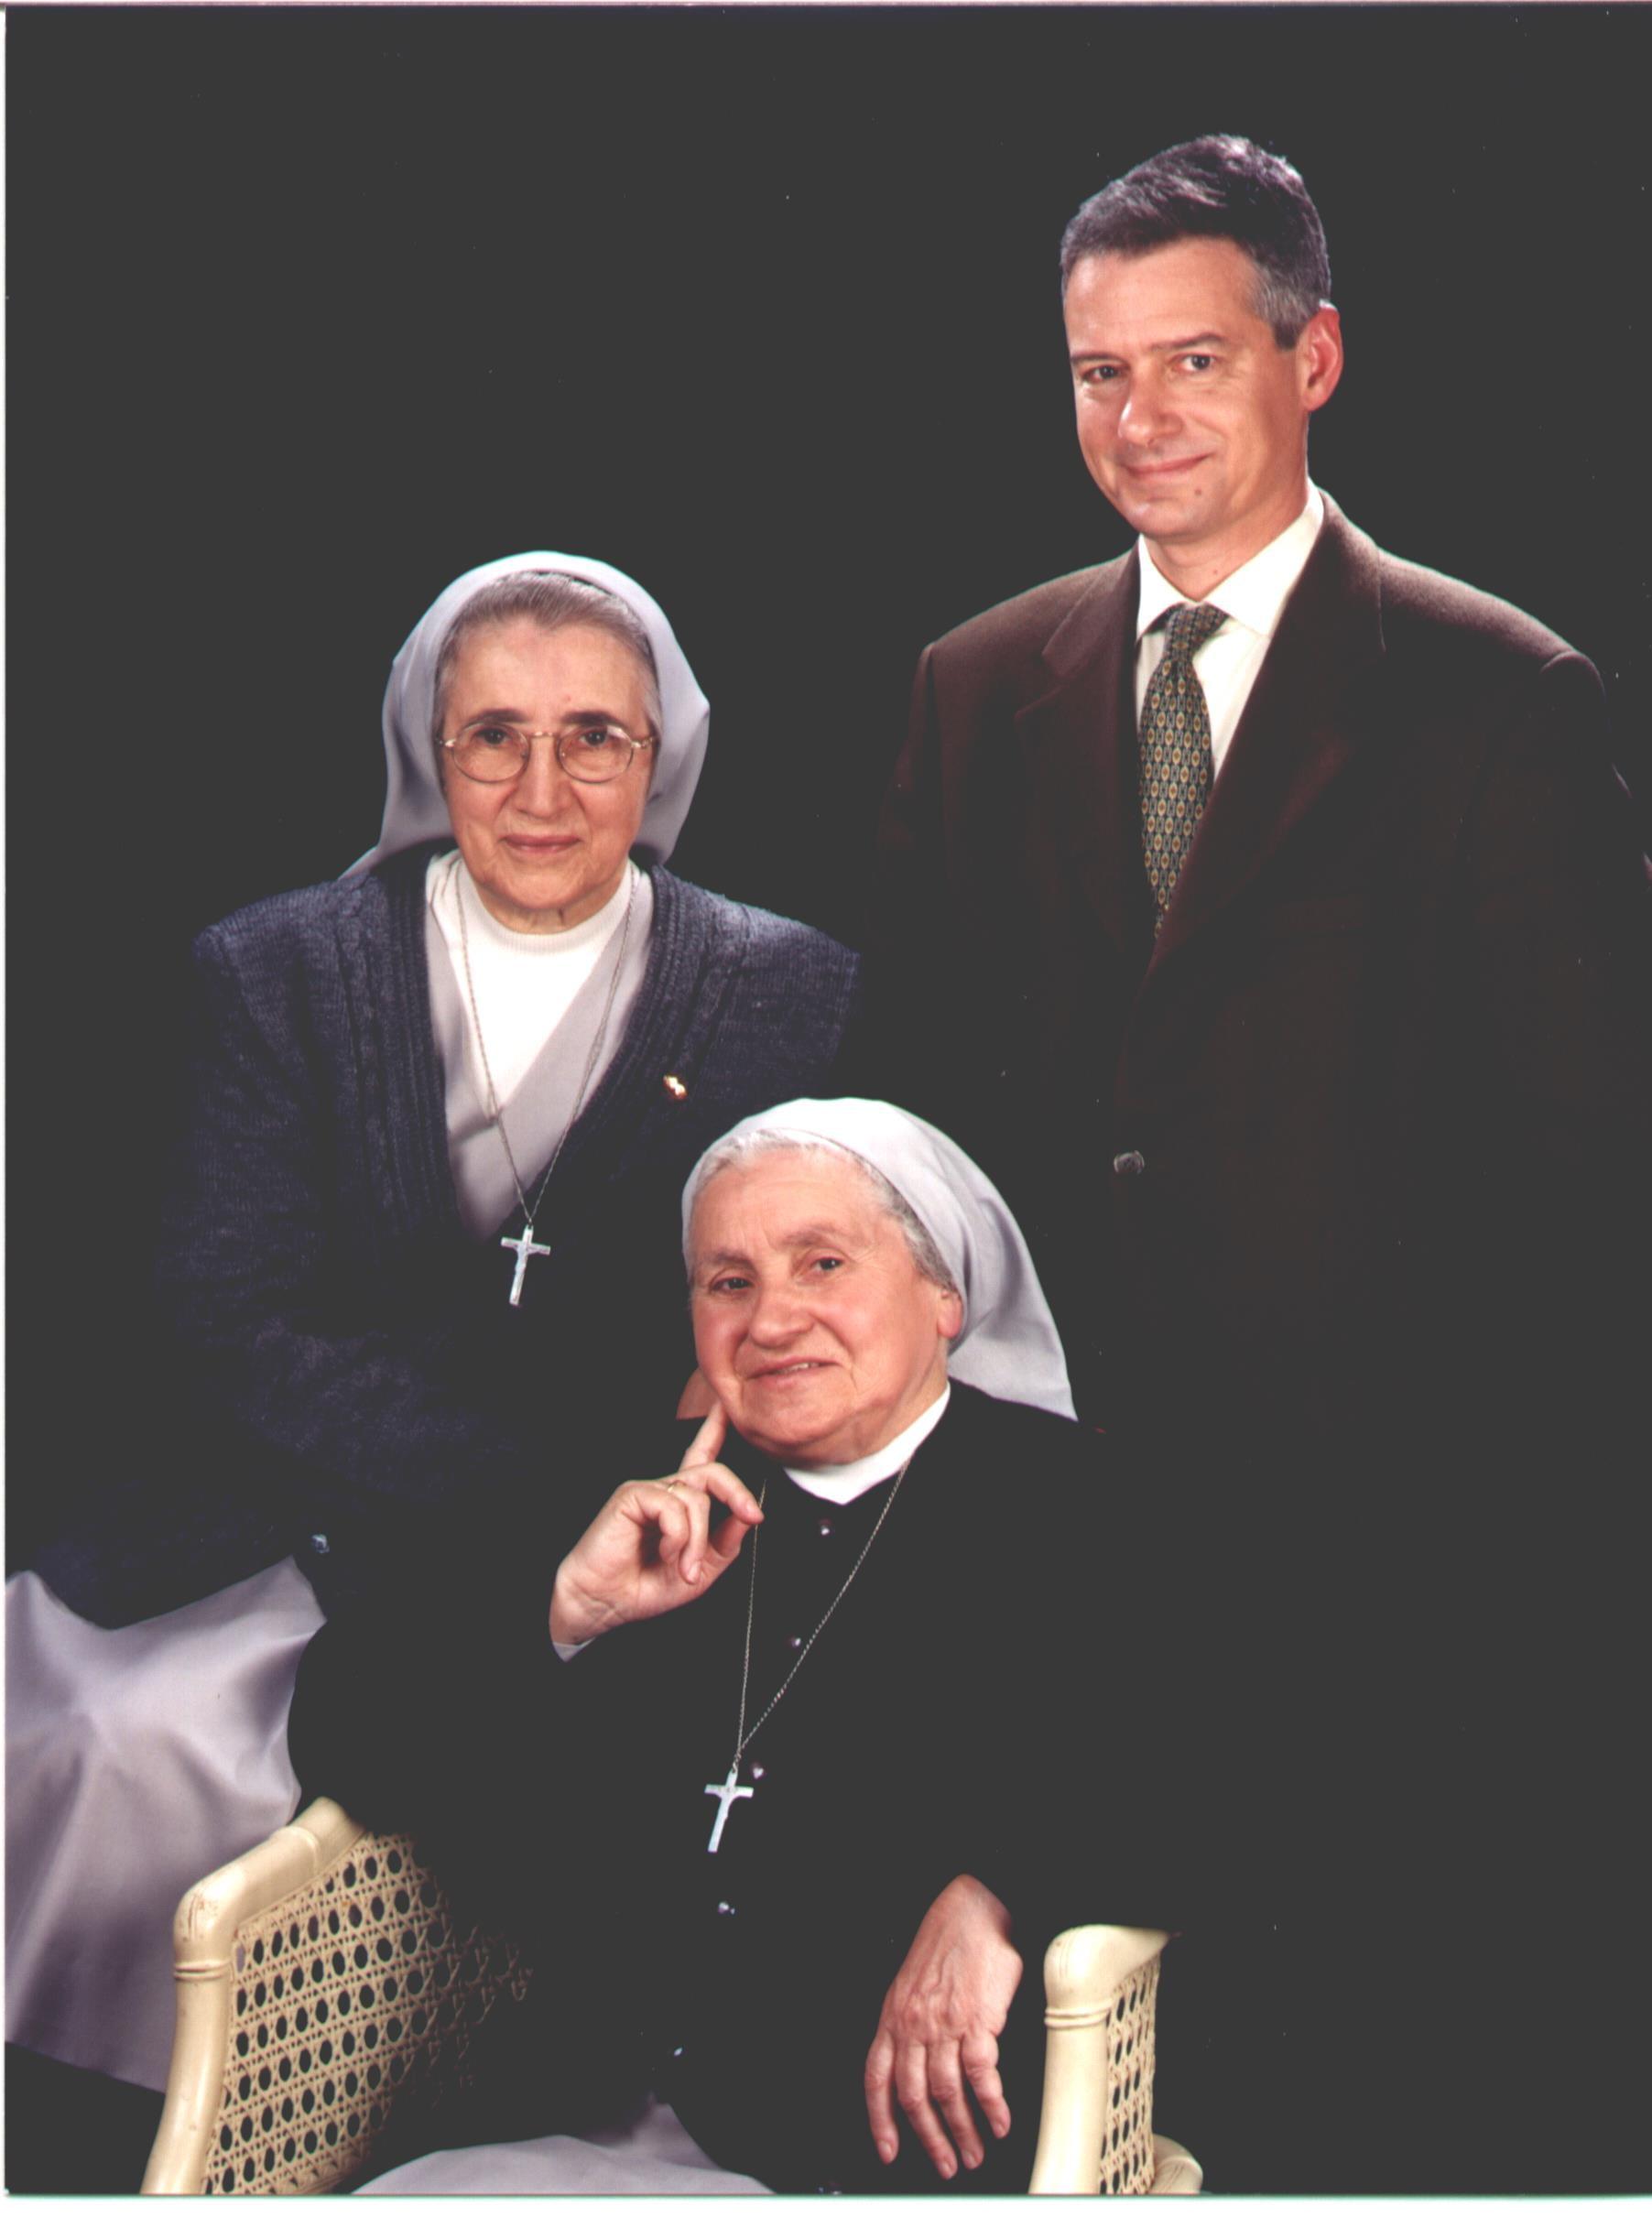 Sres. Mª. Nieves Ibarra Aristu i Sofía Paz Garayoa Artazcoz i Sr. Carlos Sanrama Sánchez